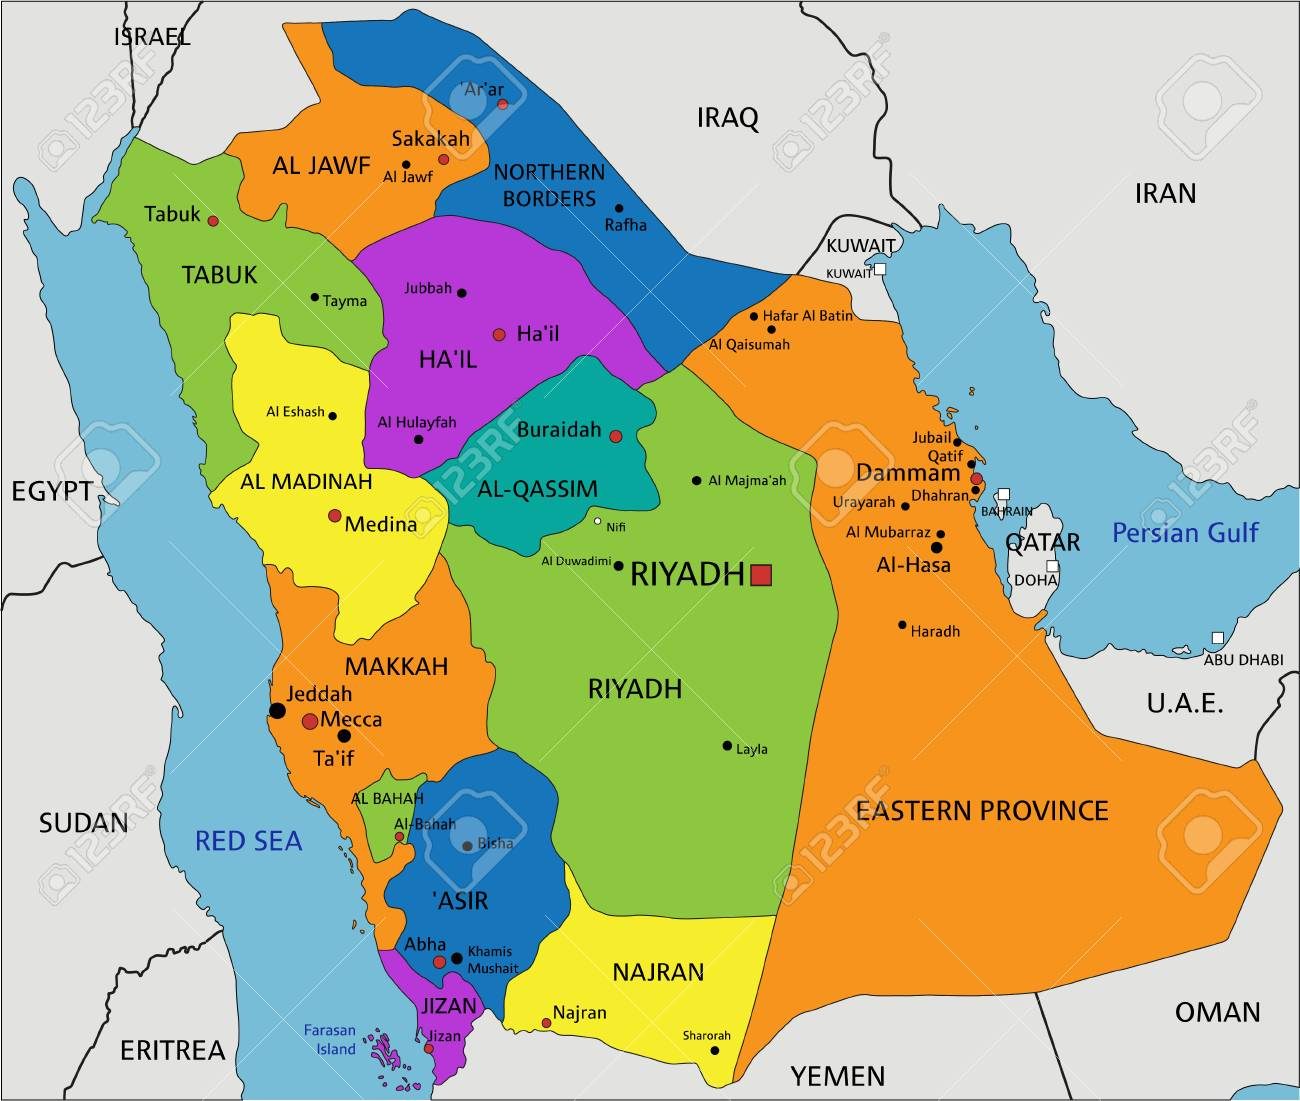 Map In Saudi Arabia on united arab emirates map, afghanistan map, algeria map, bahrain map, brazil map, kuwait map, iran map, oman map, russia map, india map, malaysia map, libya map, morocco map, great britain map, tanzania map, lebanon map, japan map, sudan map, jordan map, dubai map,